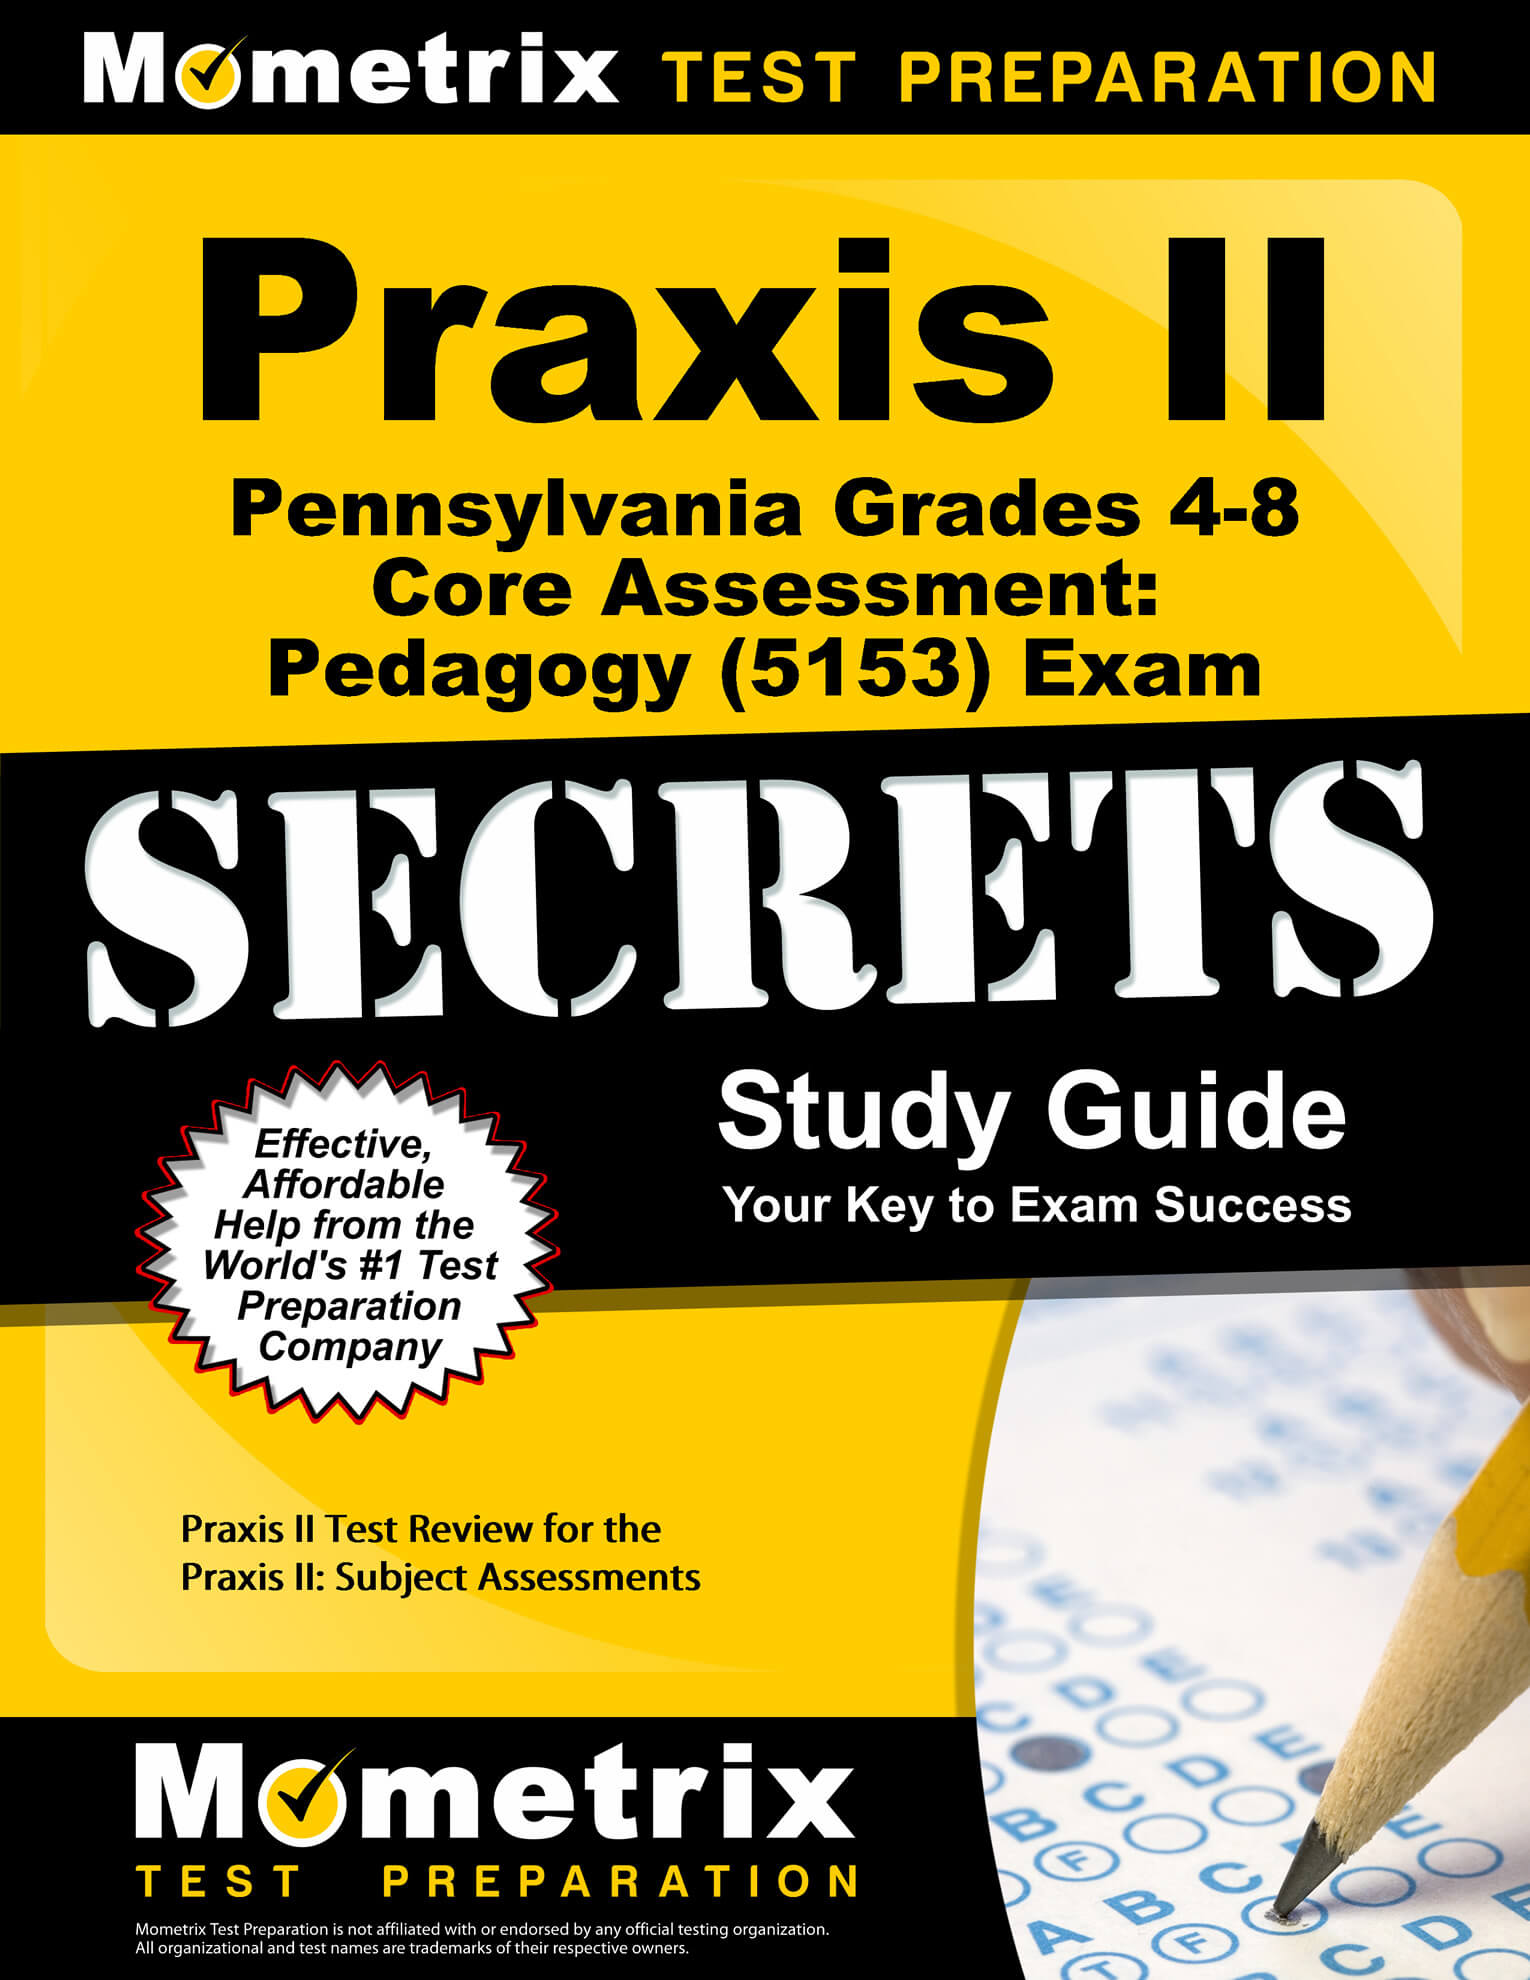 Praxis II Pennsylvania Grades 4-8 Core Assessment: Pedagogy Study Guide